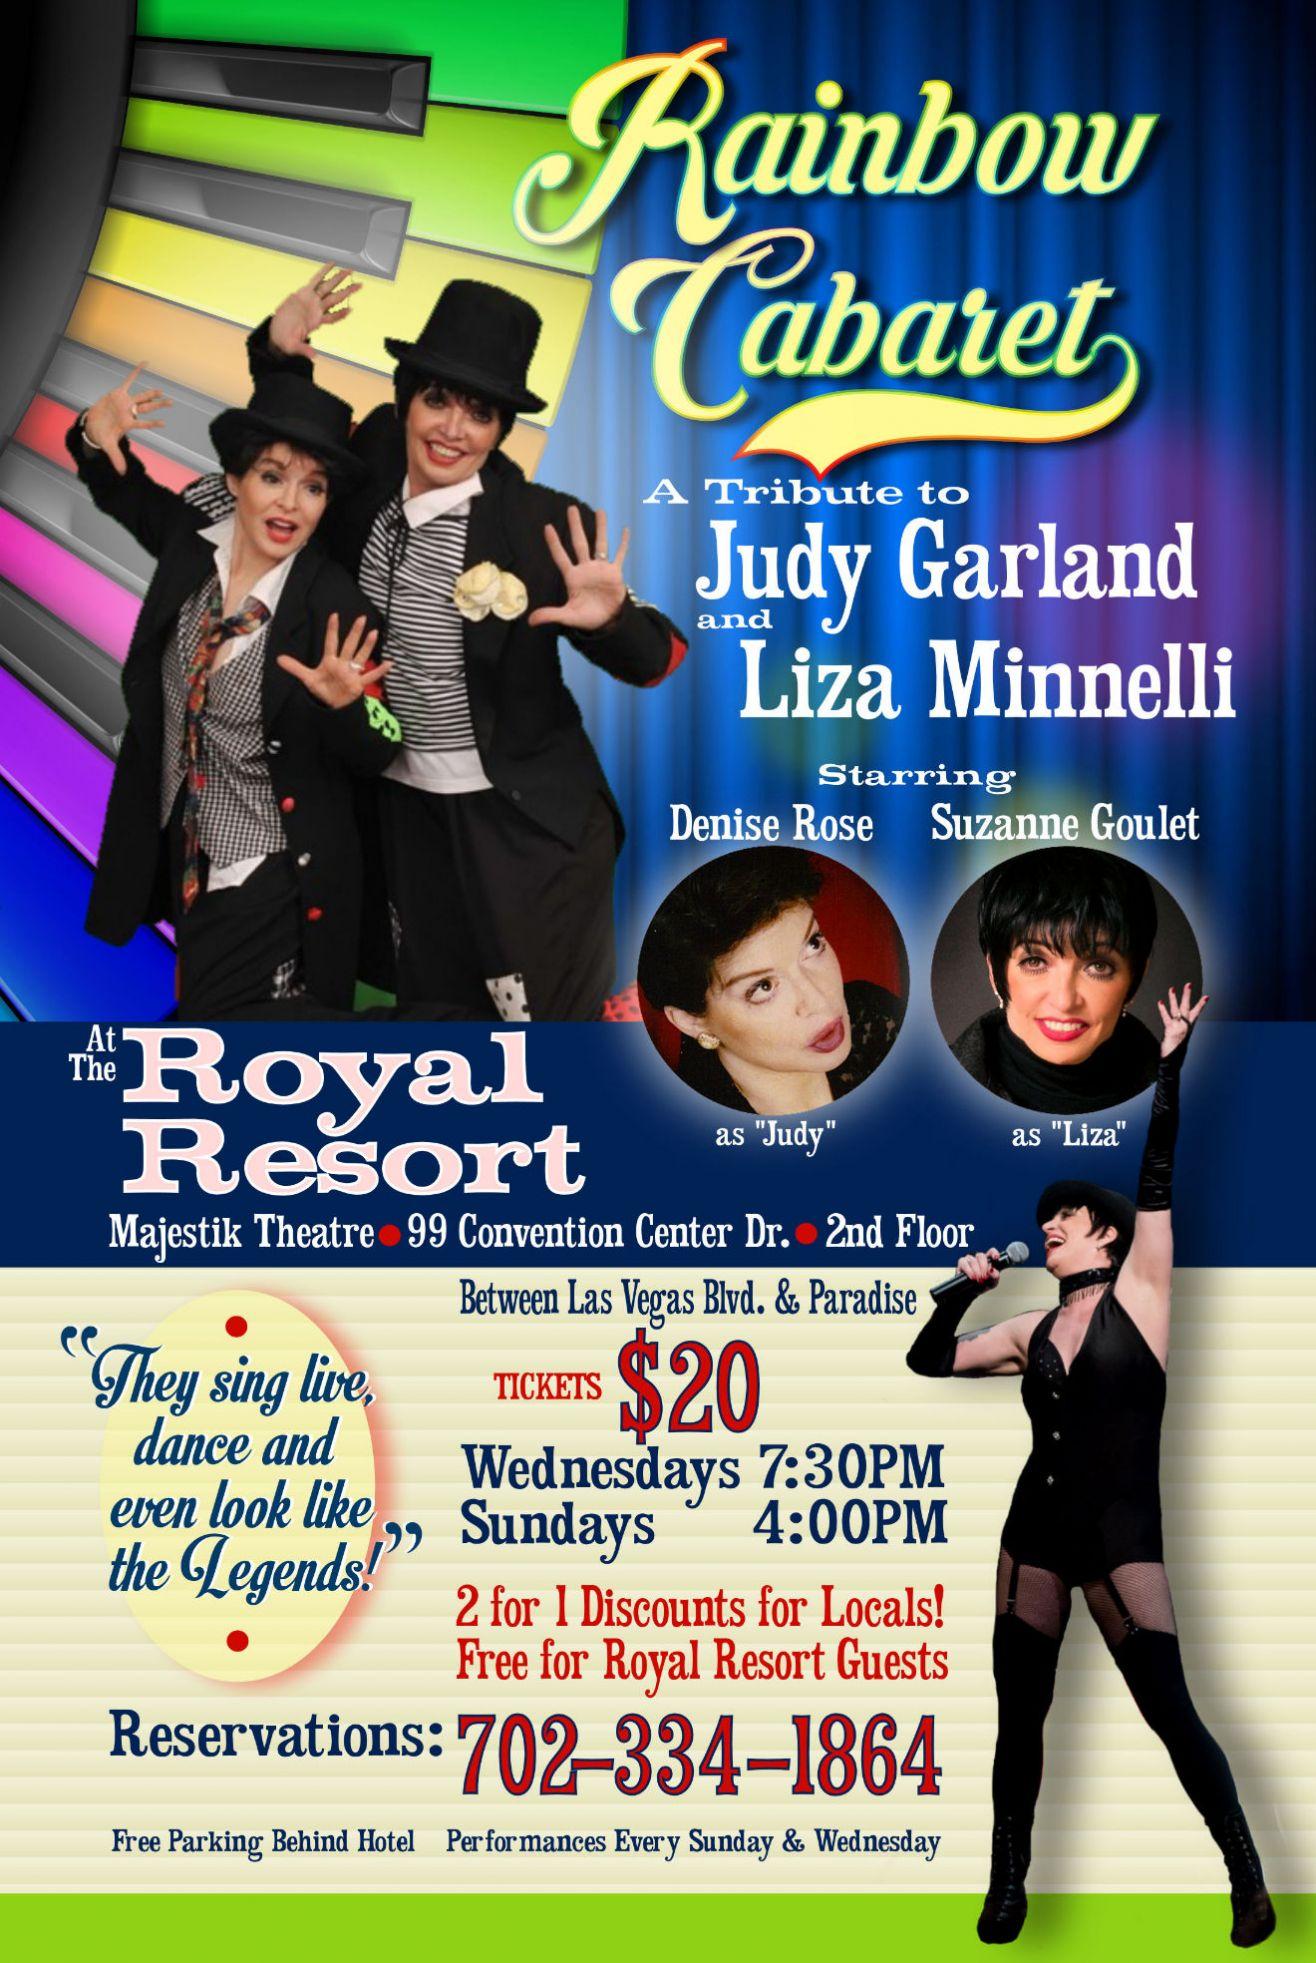 """Rainbow Cabaret"" Tribute to Liza Minnelli & Judy Garland"